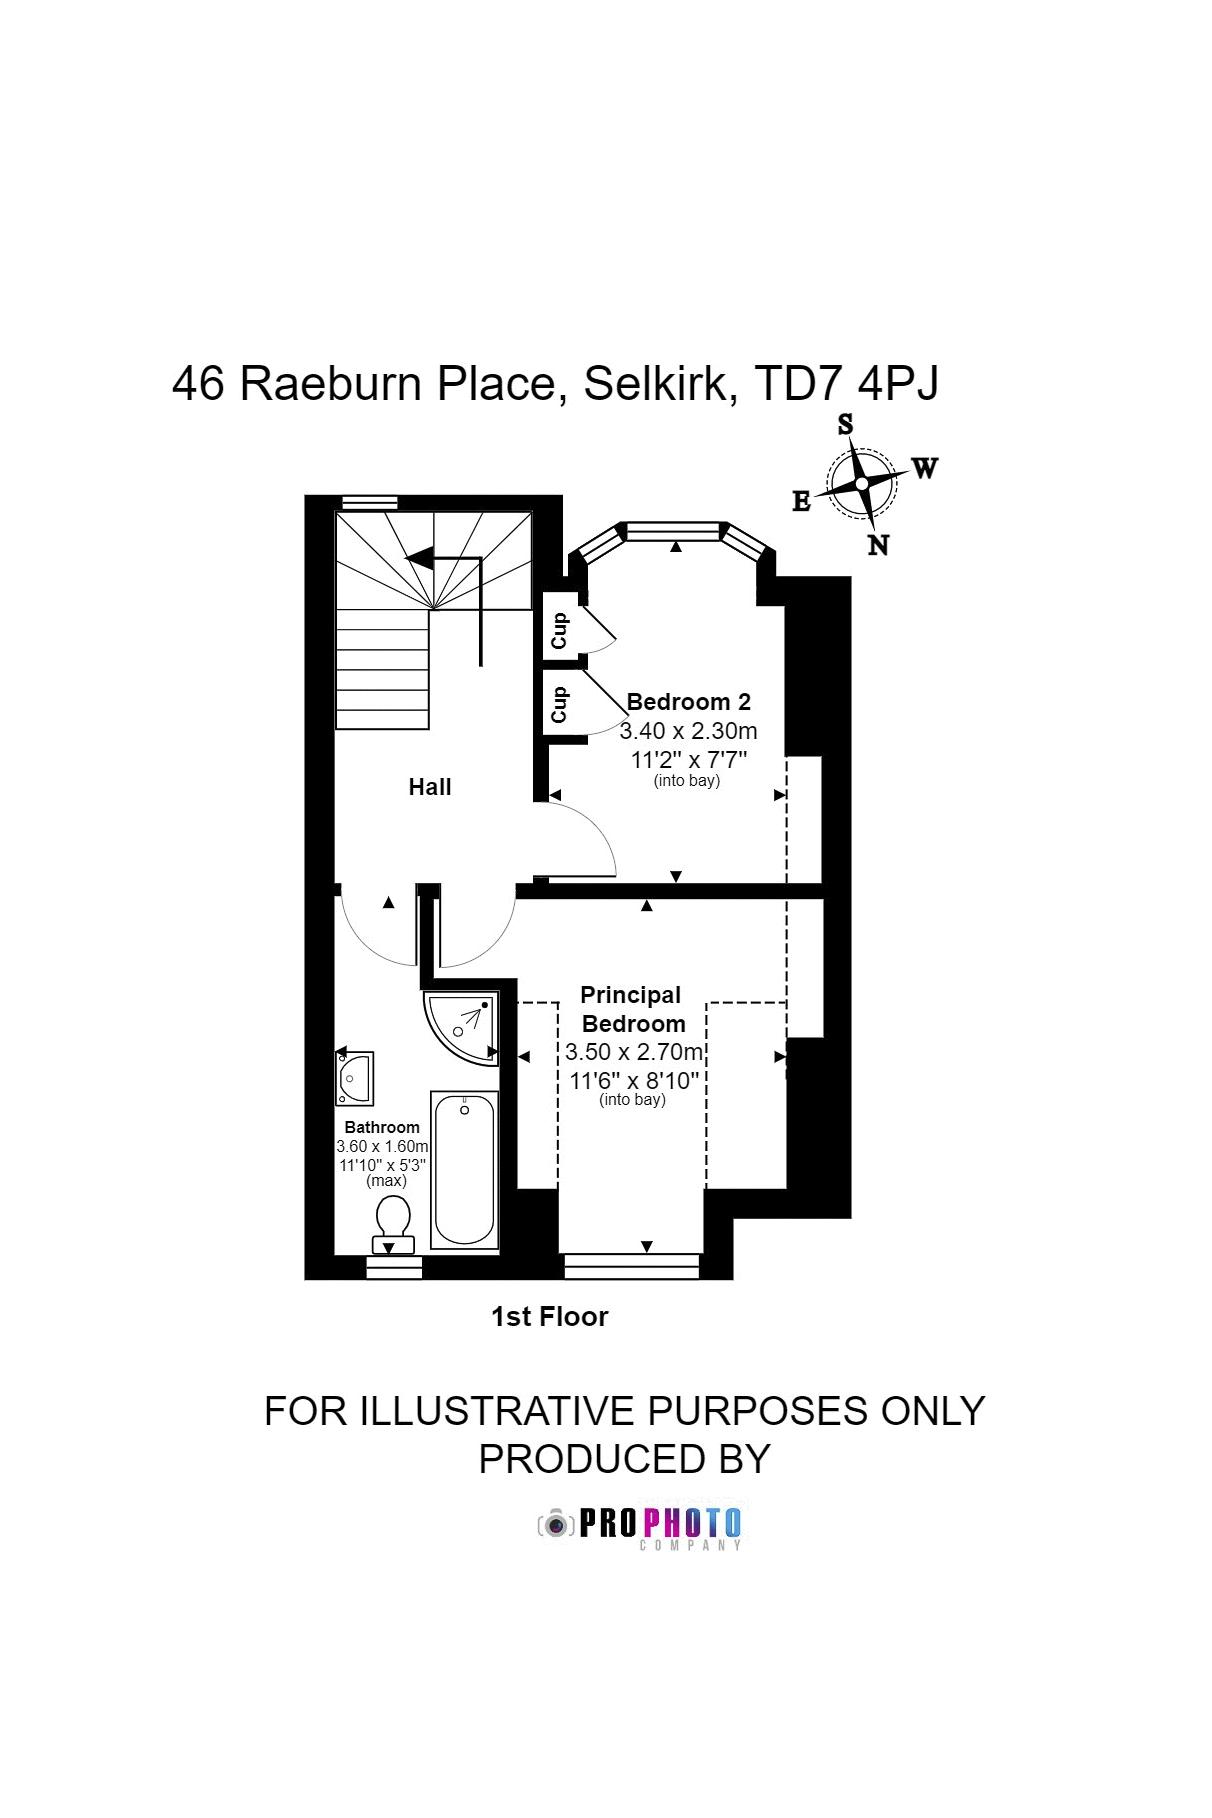 46 Raeburn Place First Floor